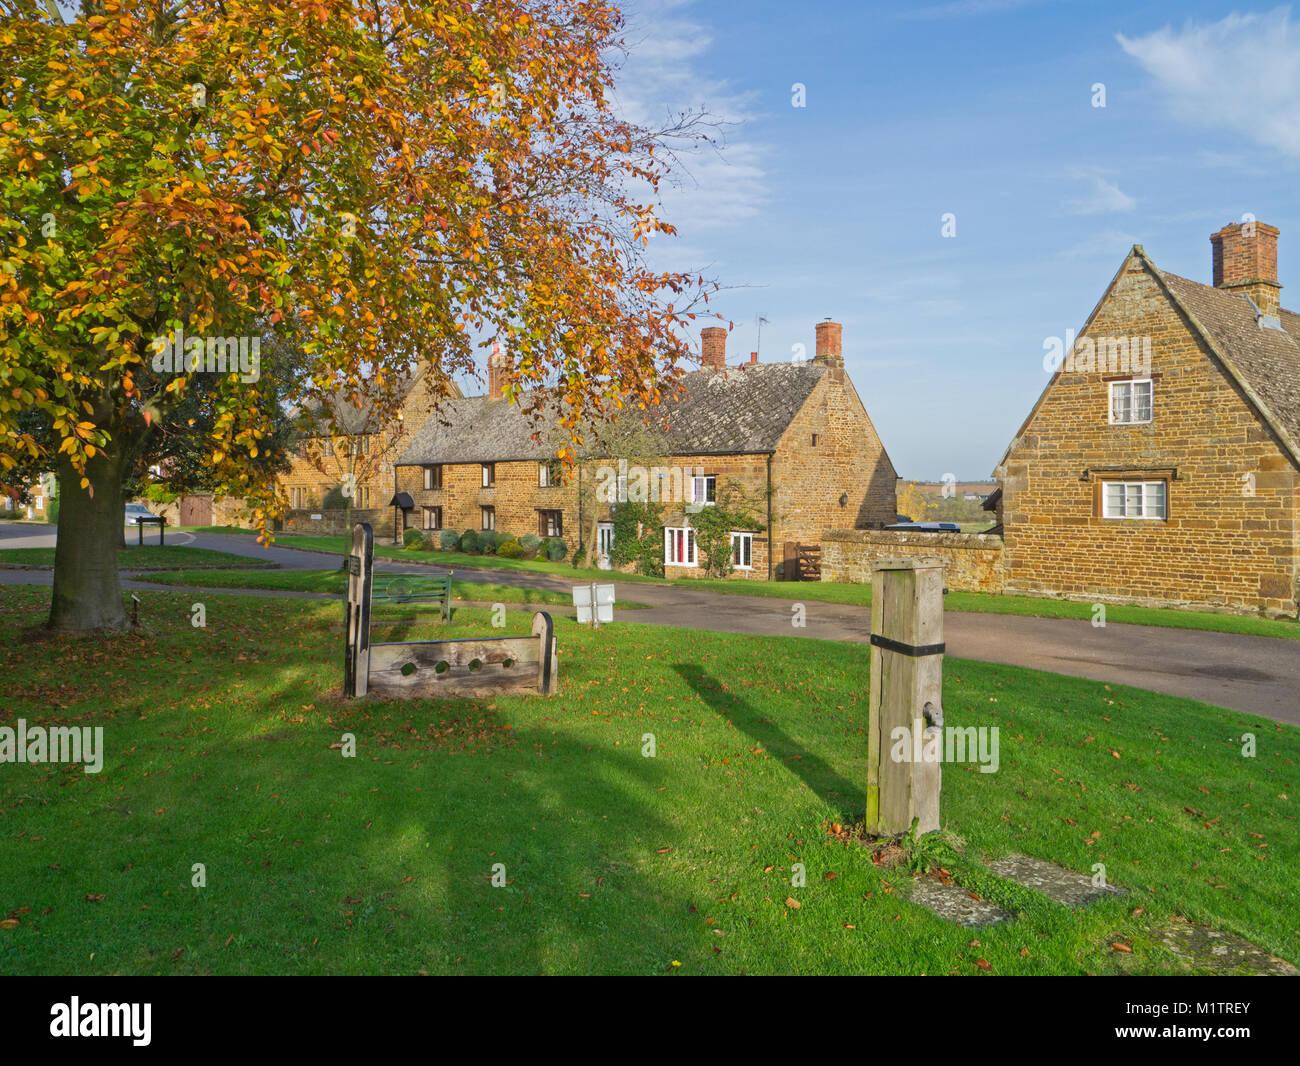 La bonita aldea verde en Eydon, Northamptonshire, Reino Unido; con ...